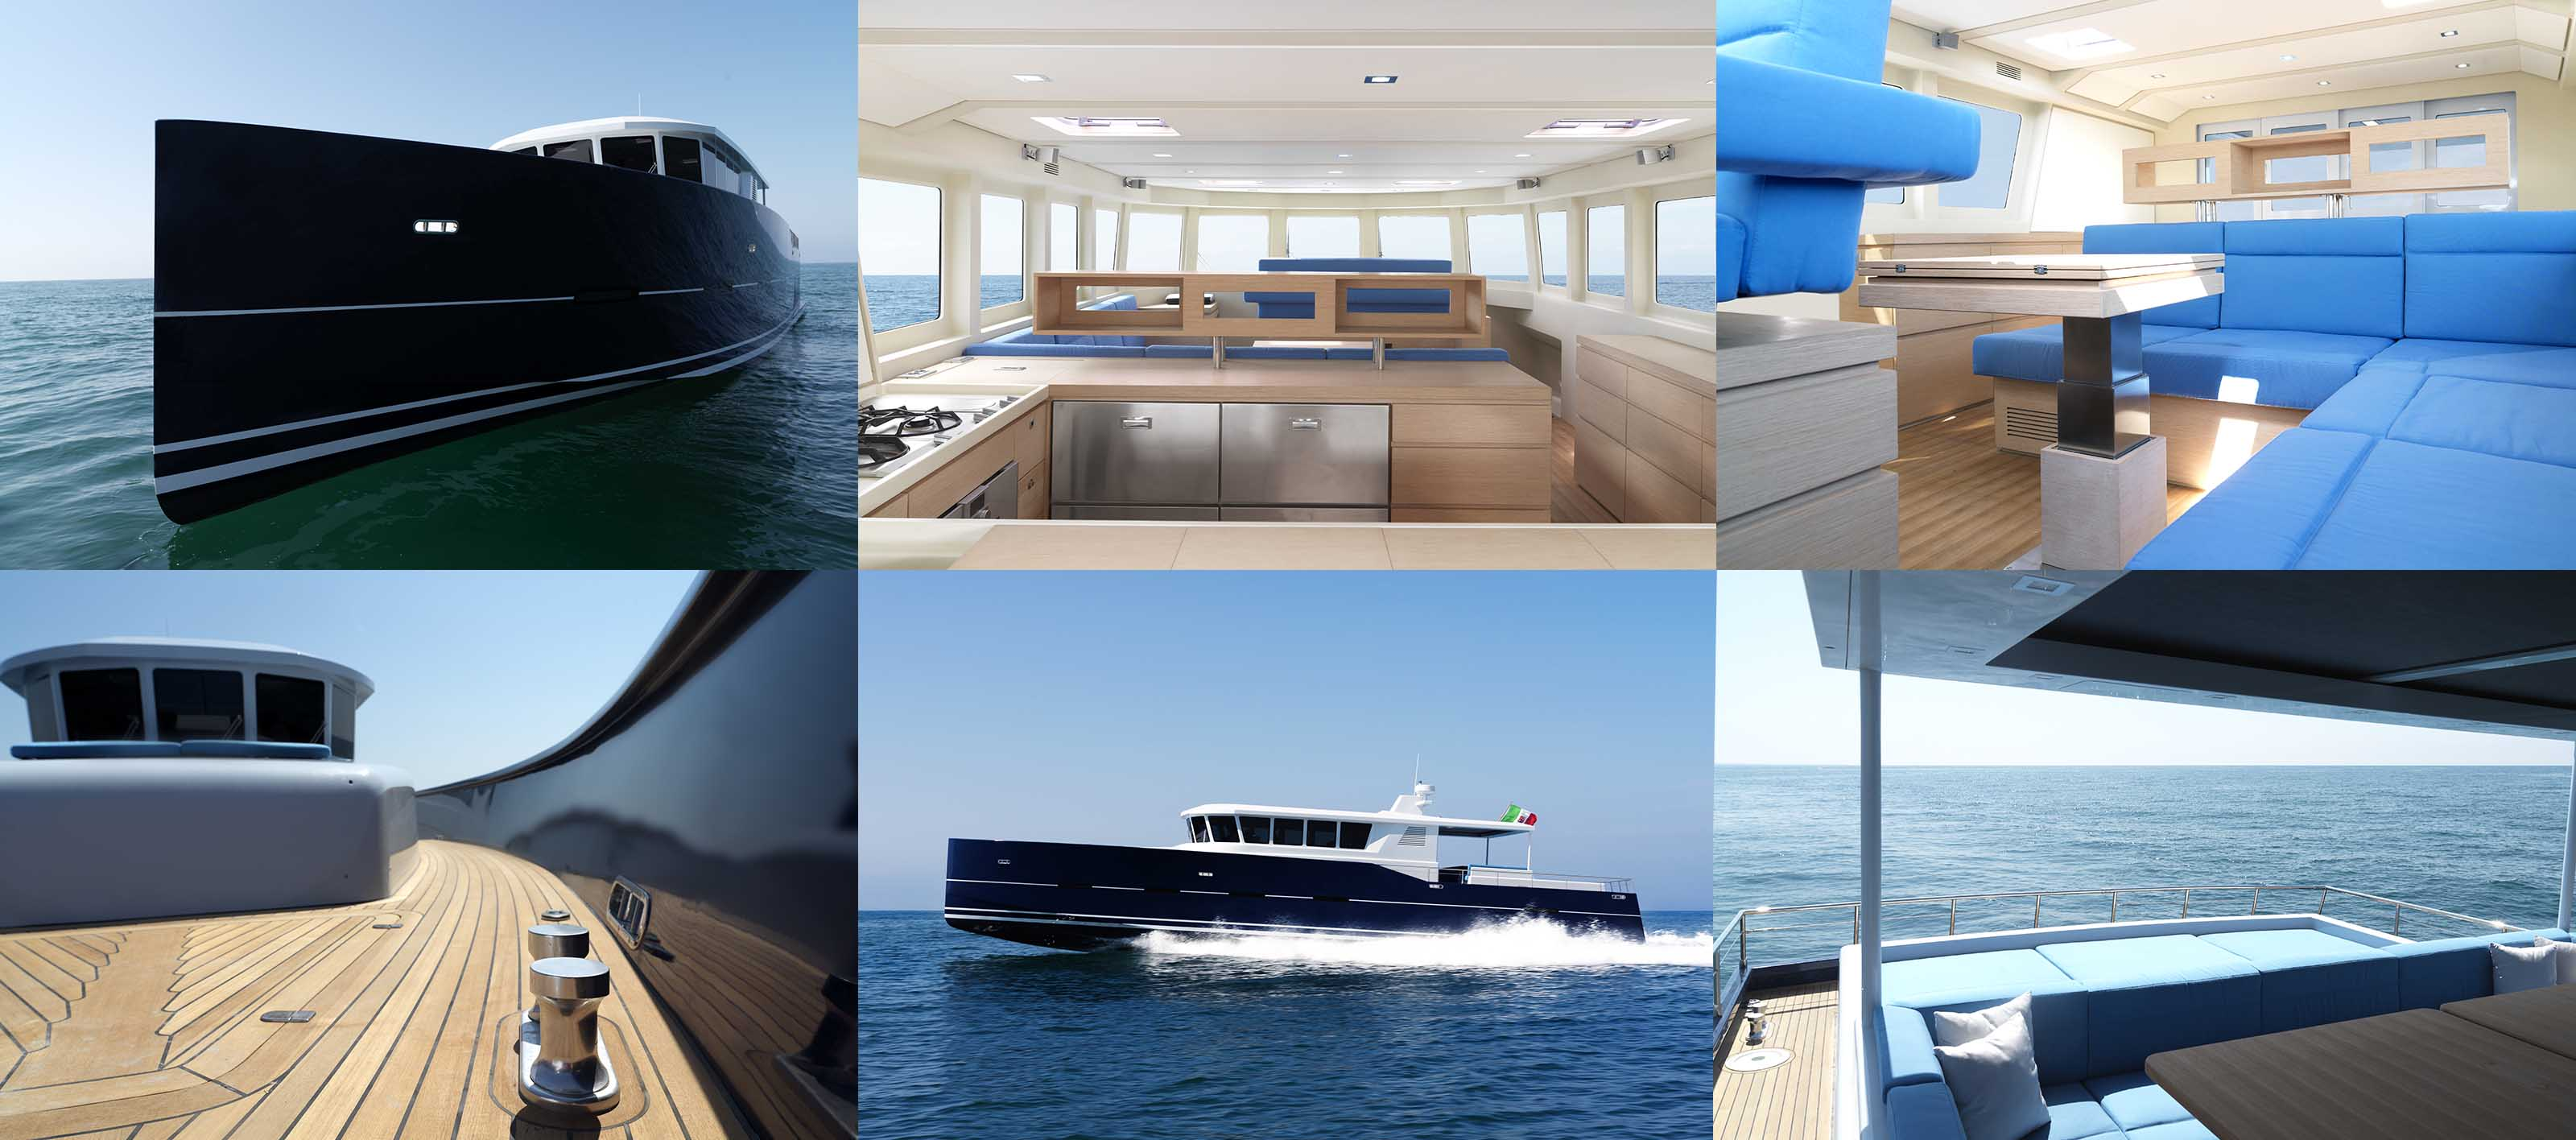 Vismara yacht servizio fotografico nautica